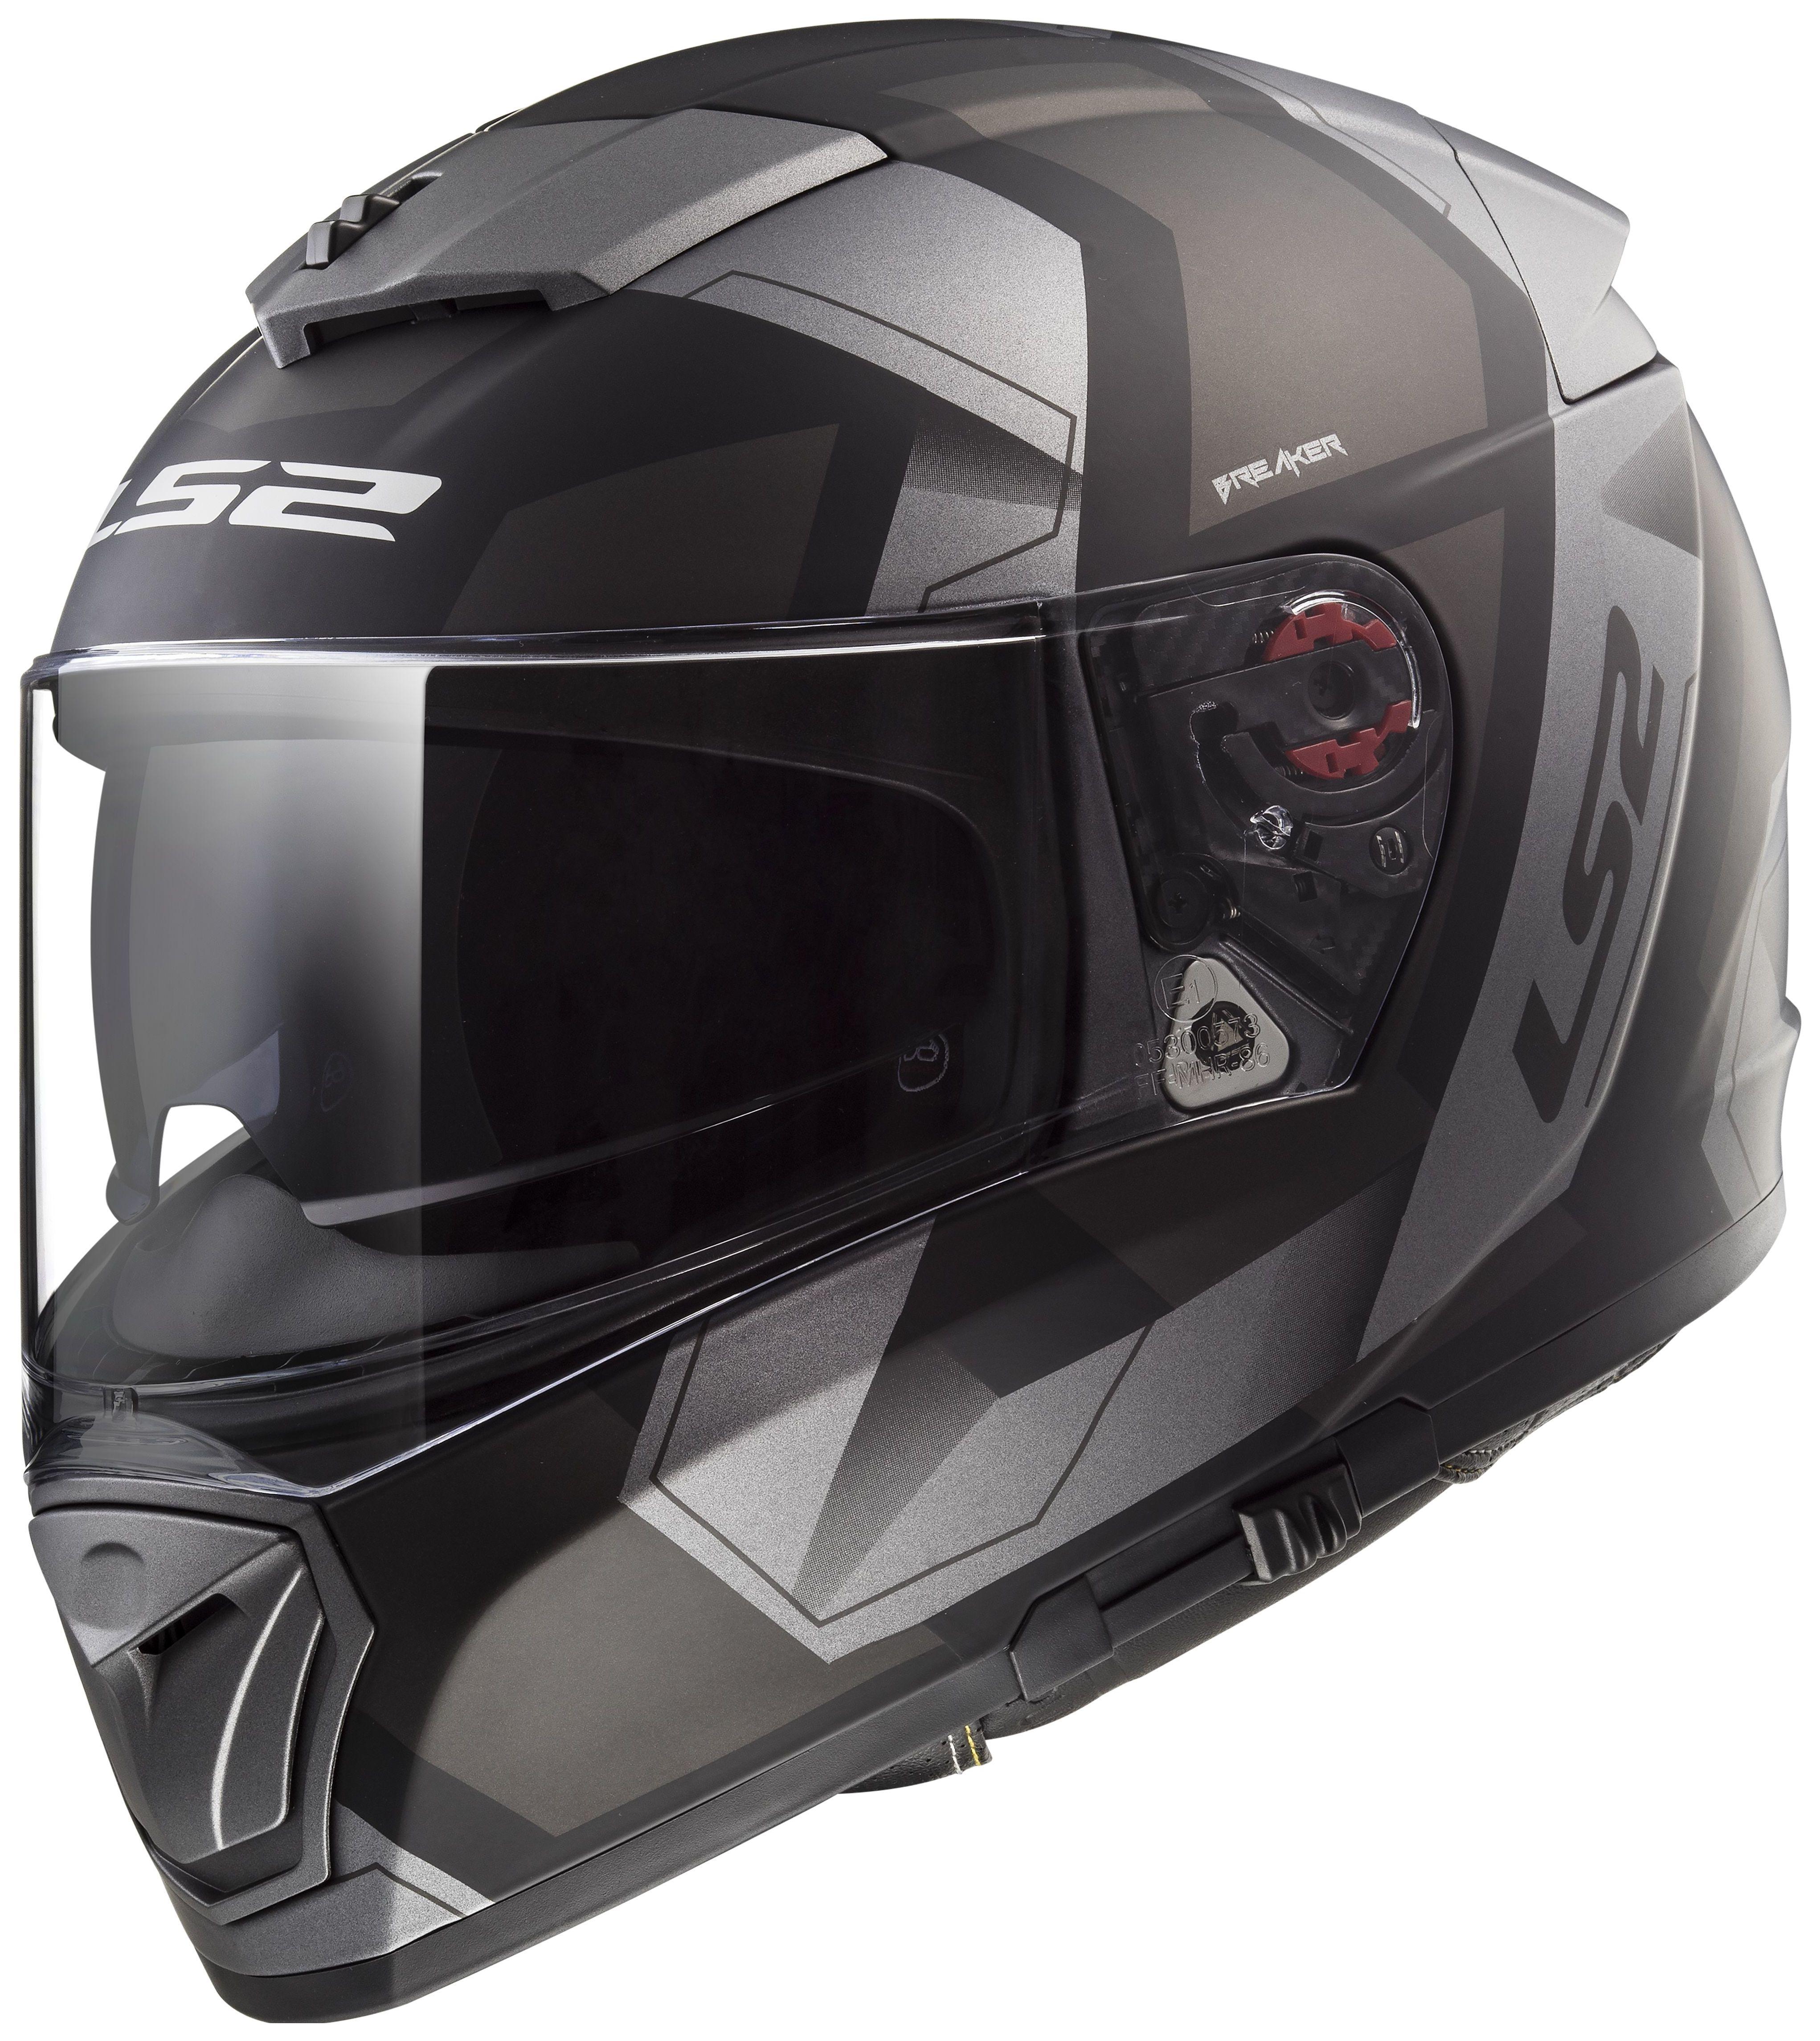 Bell Racing Helmets >> LS2 Breaker Physics Helmet (XS and SM) - Cycle Gear